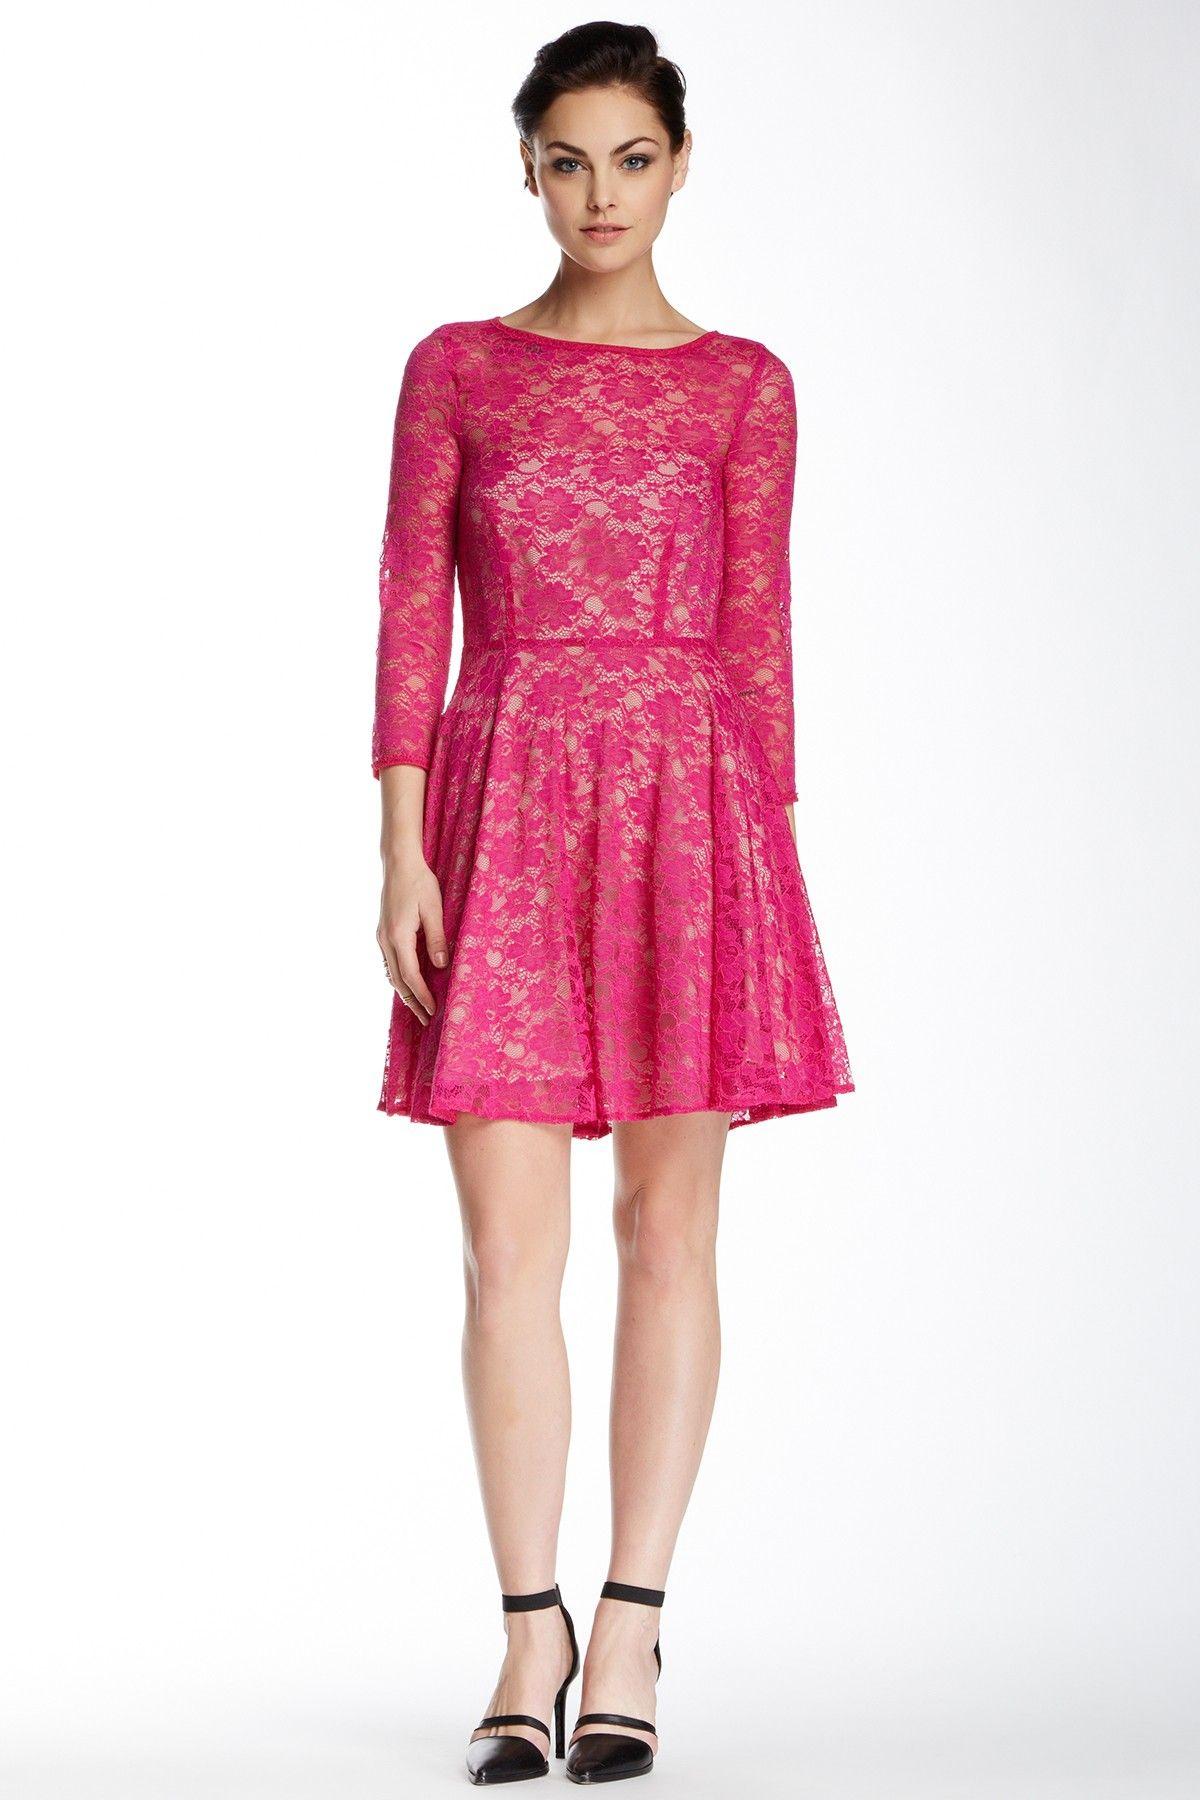 French connection lizzie lace dress dresses lace